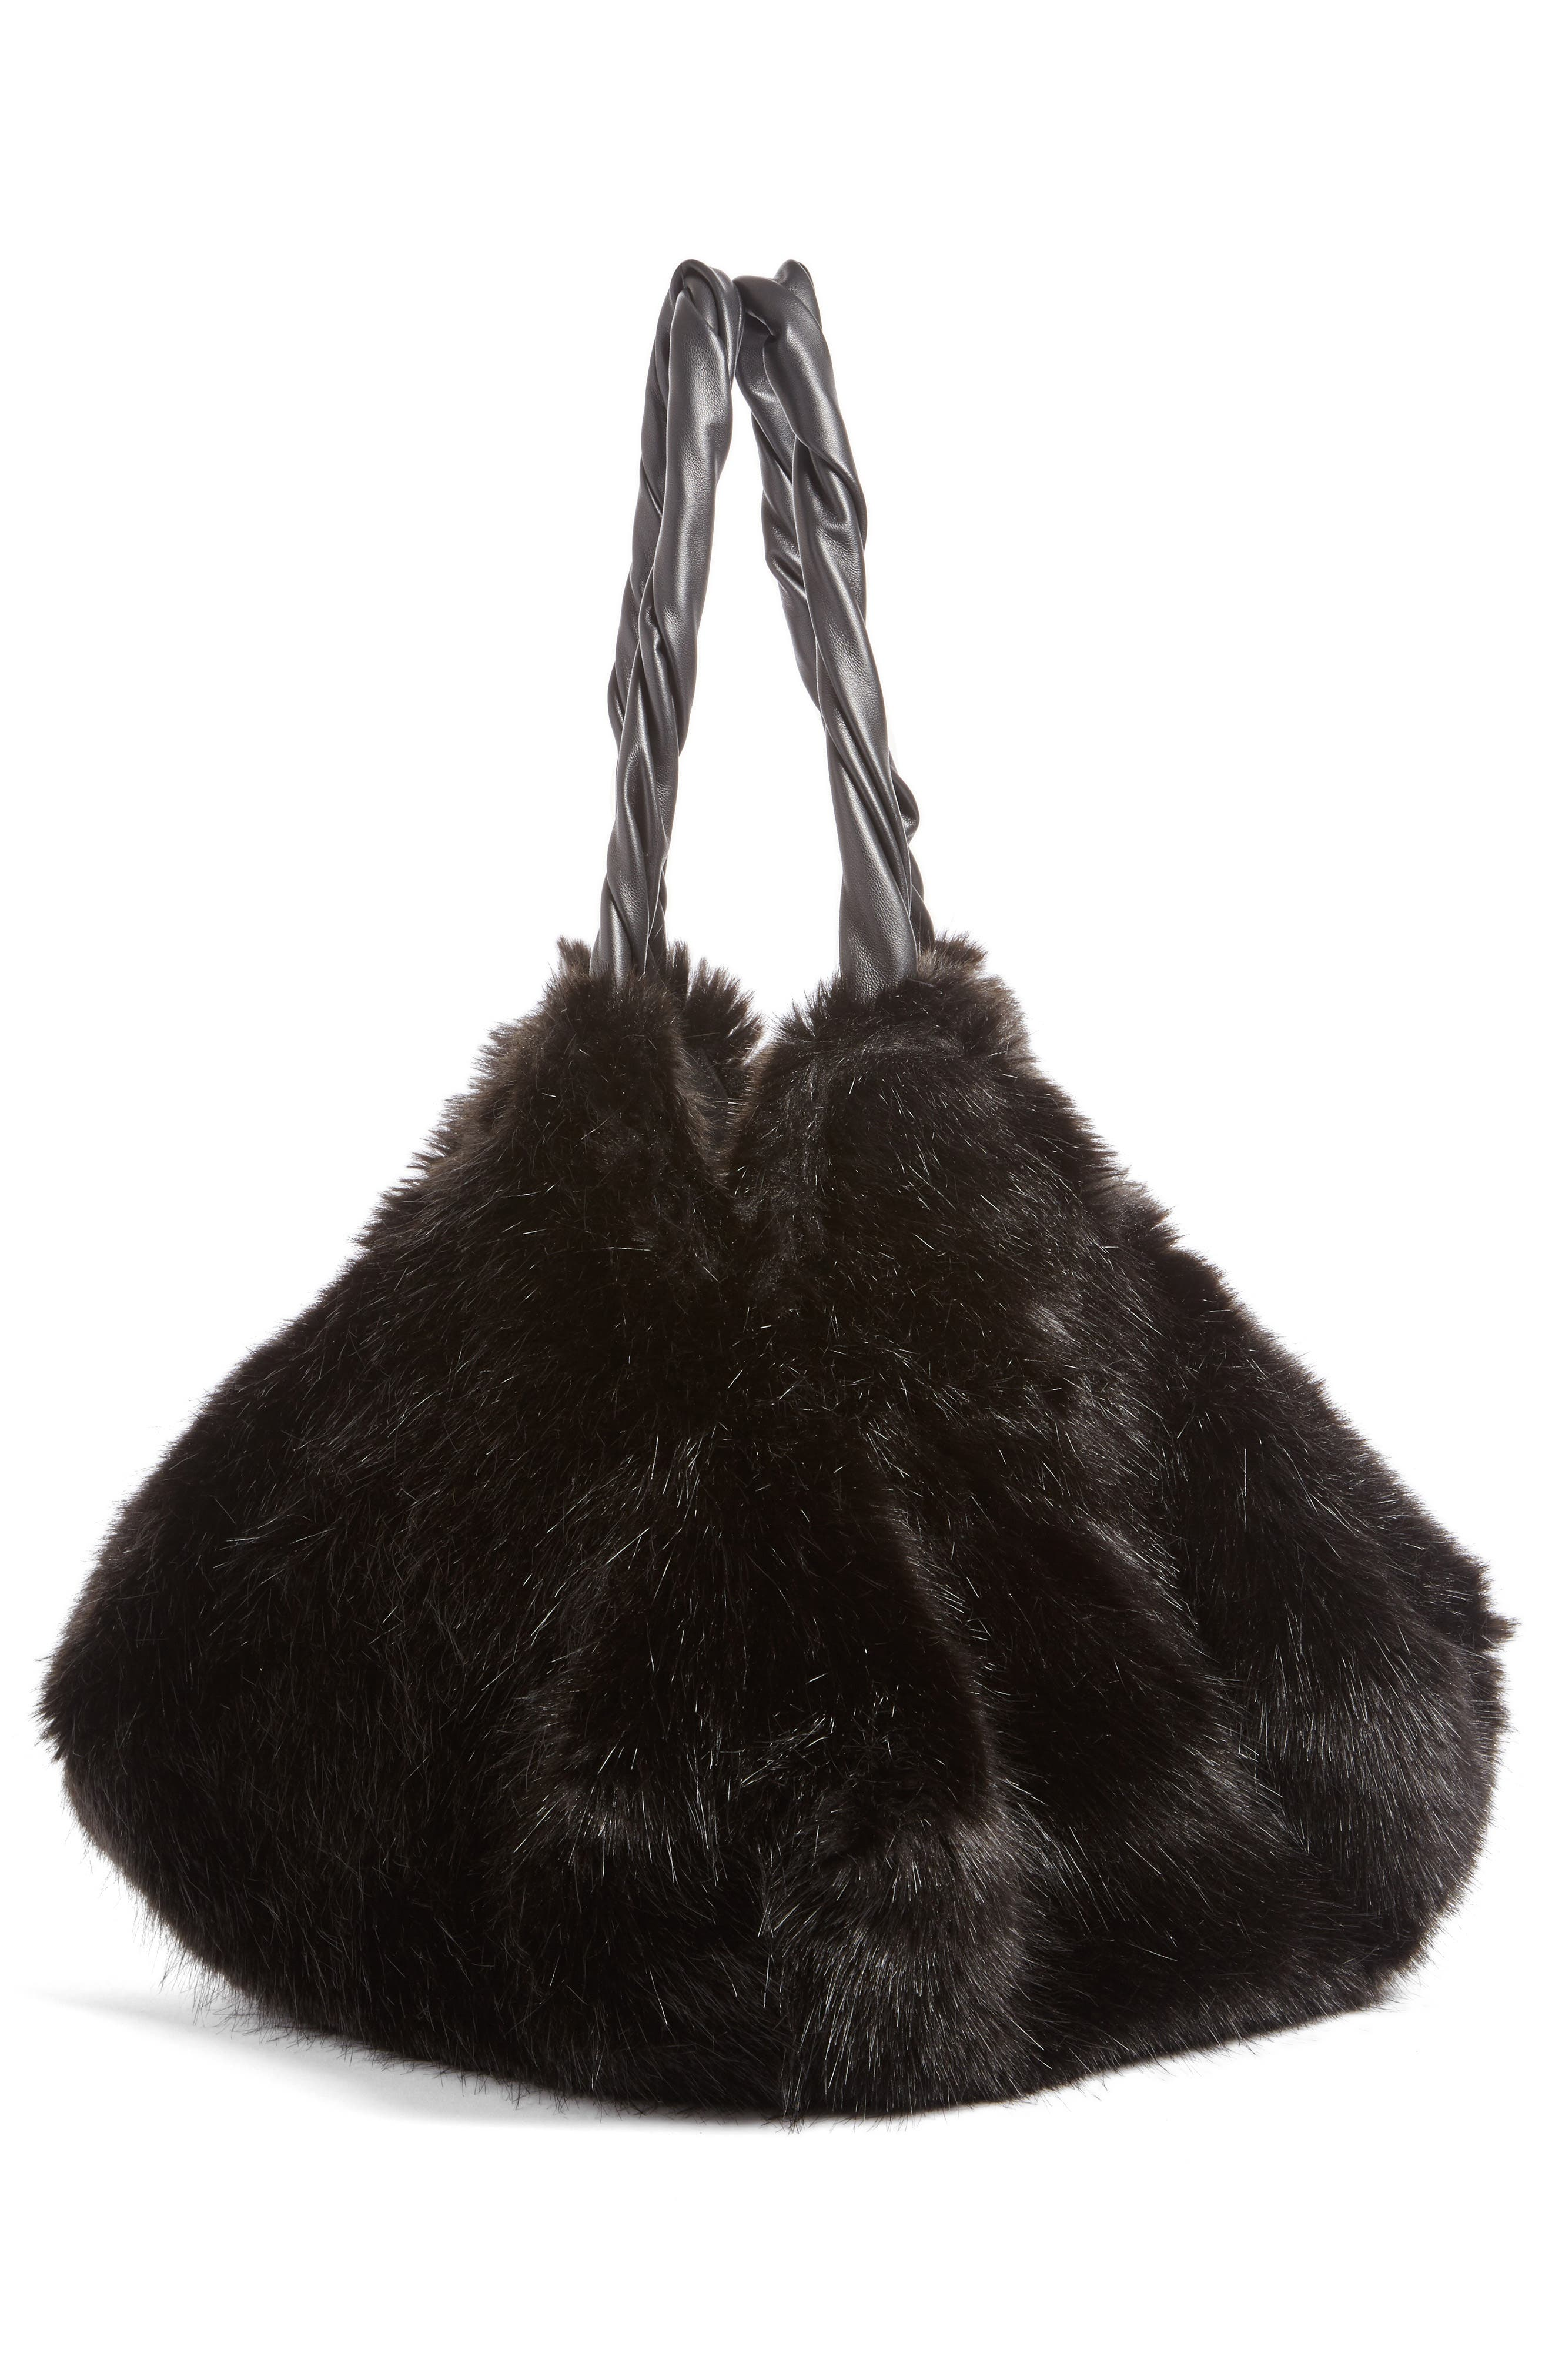 Pyramid Faux Fur Shoulder Bag,                             Alternate thumbnail 3, color,                             001